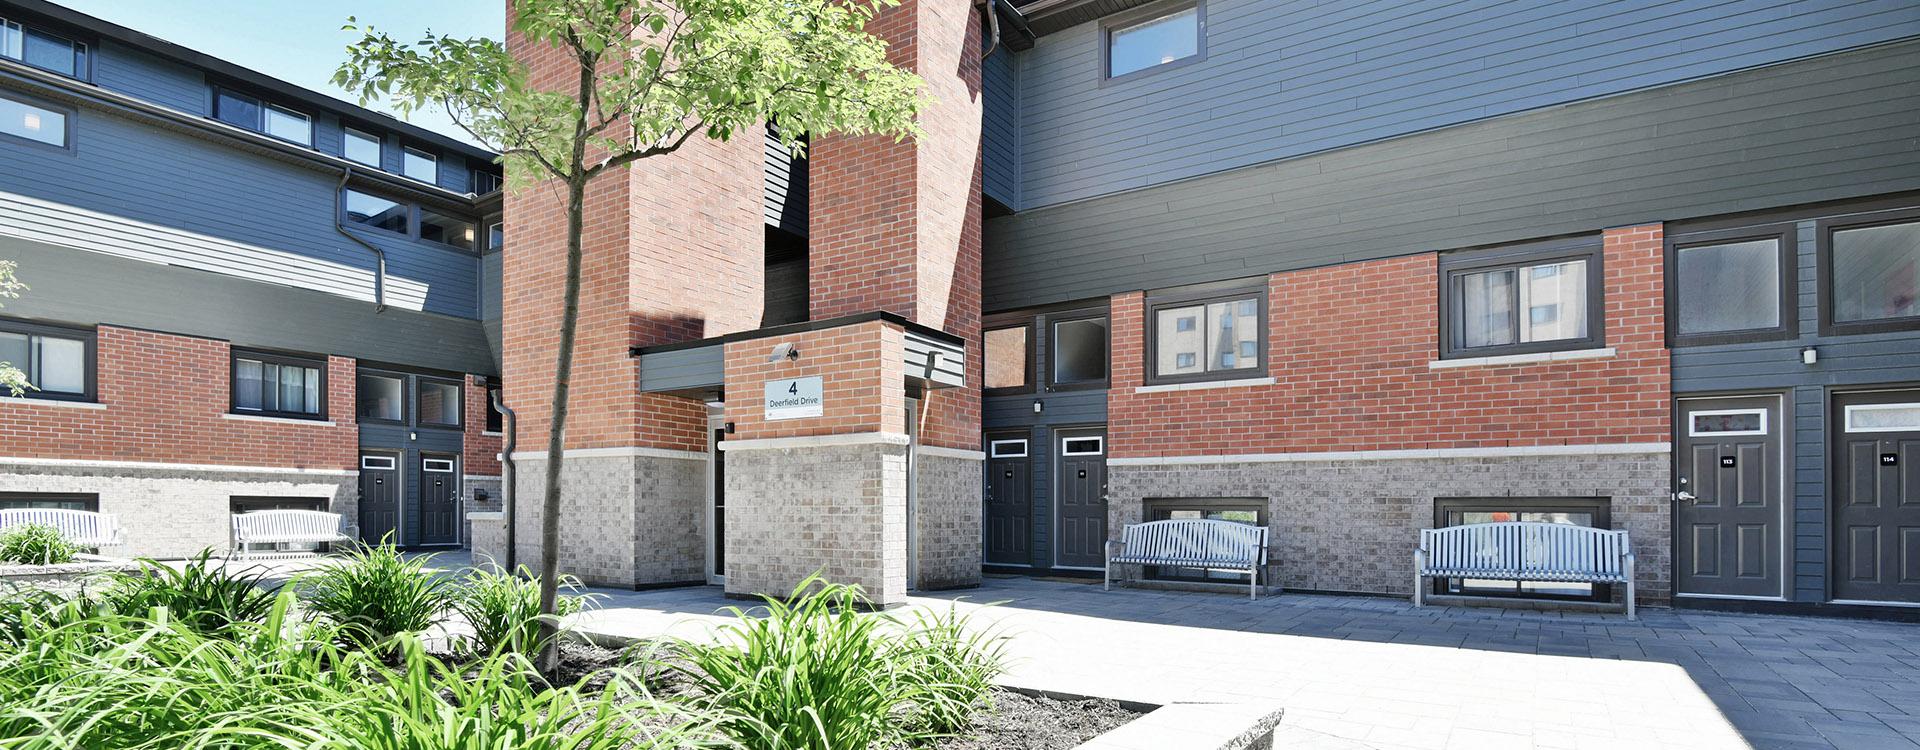 navaho-apartments-10-deerfield-drive-nepean-exterior